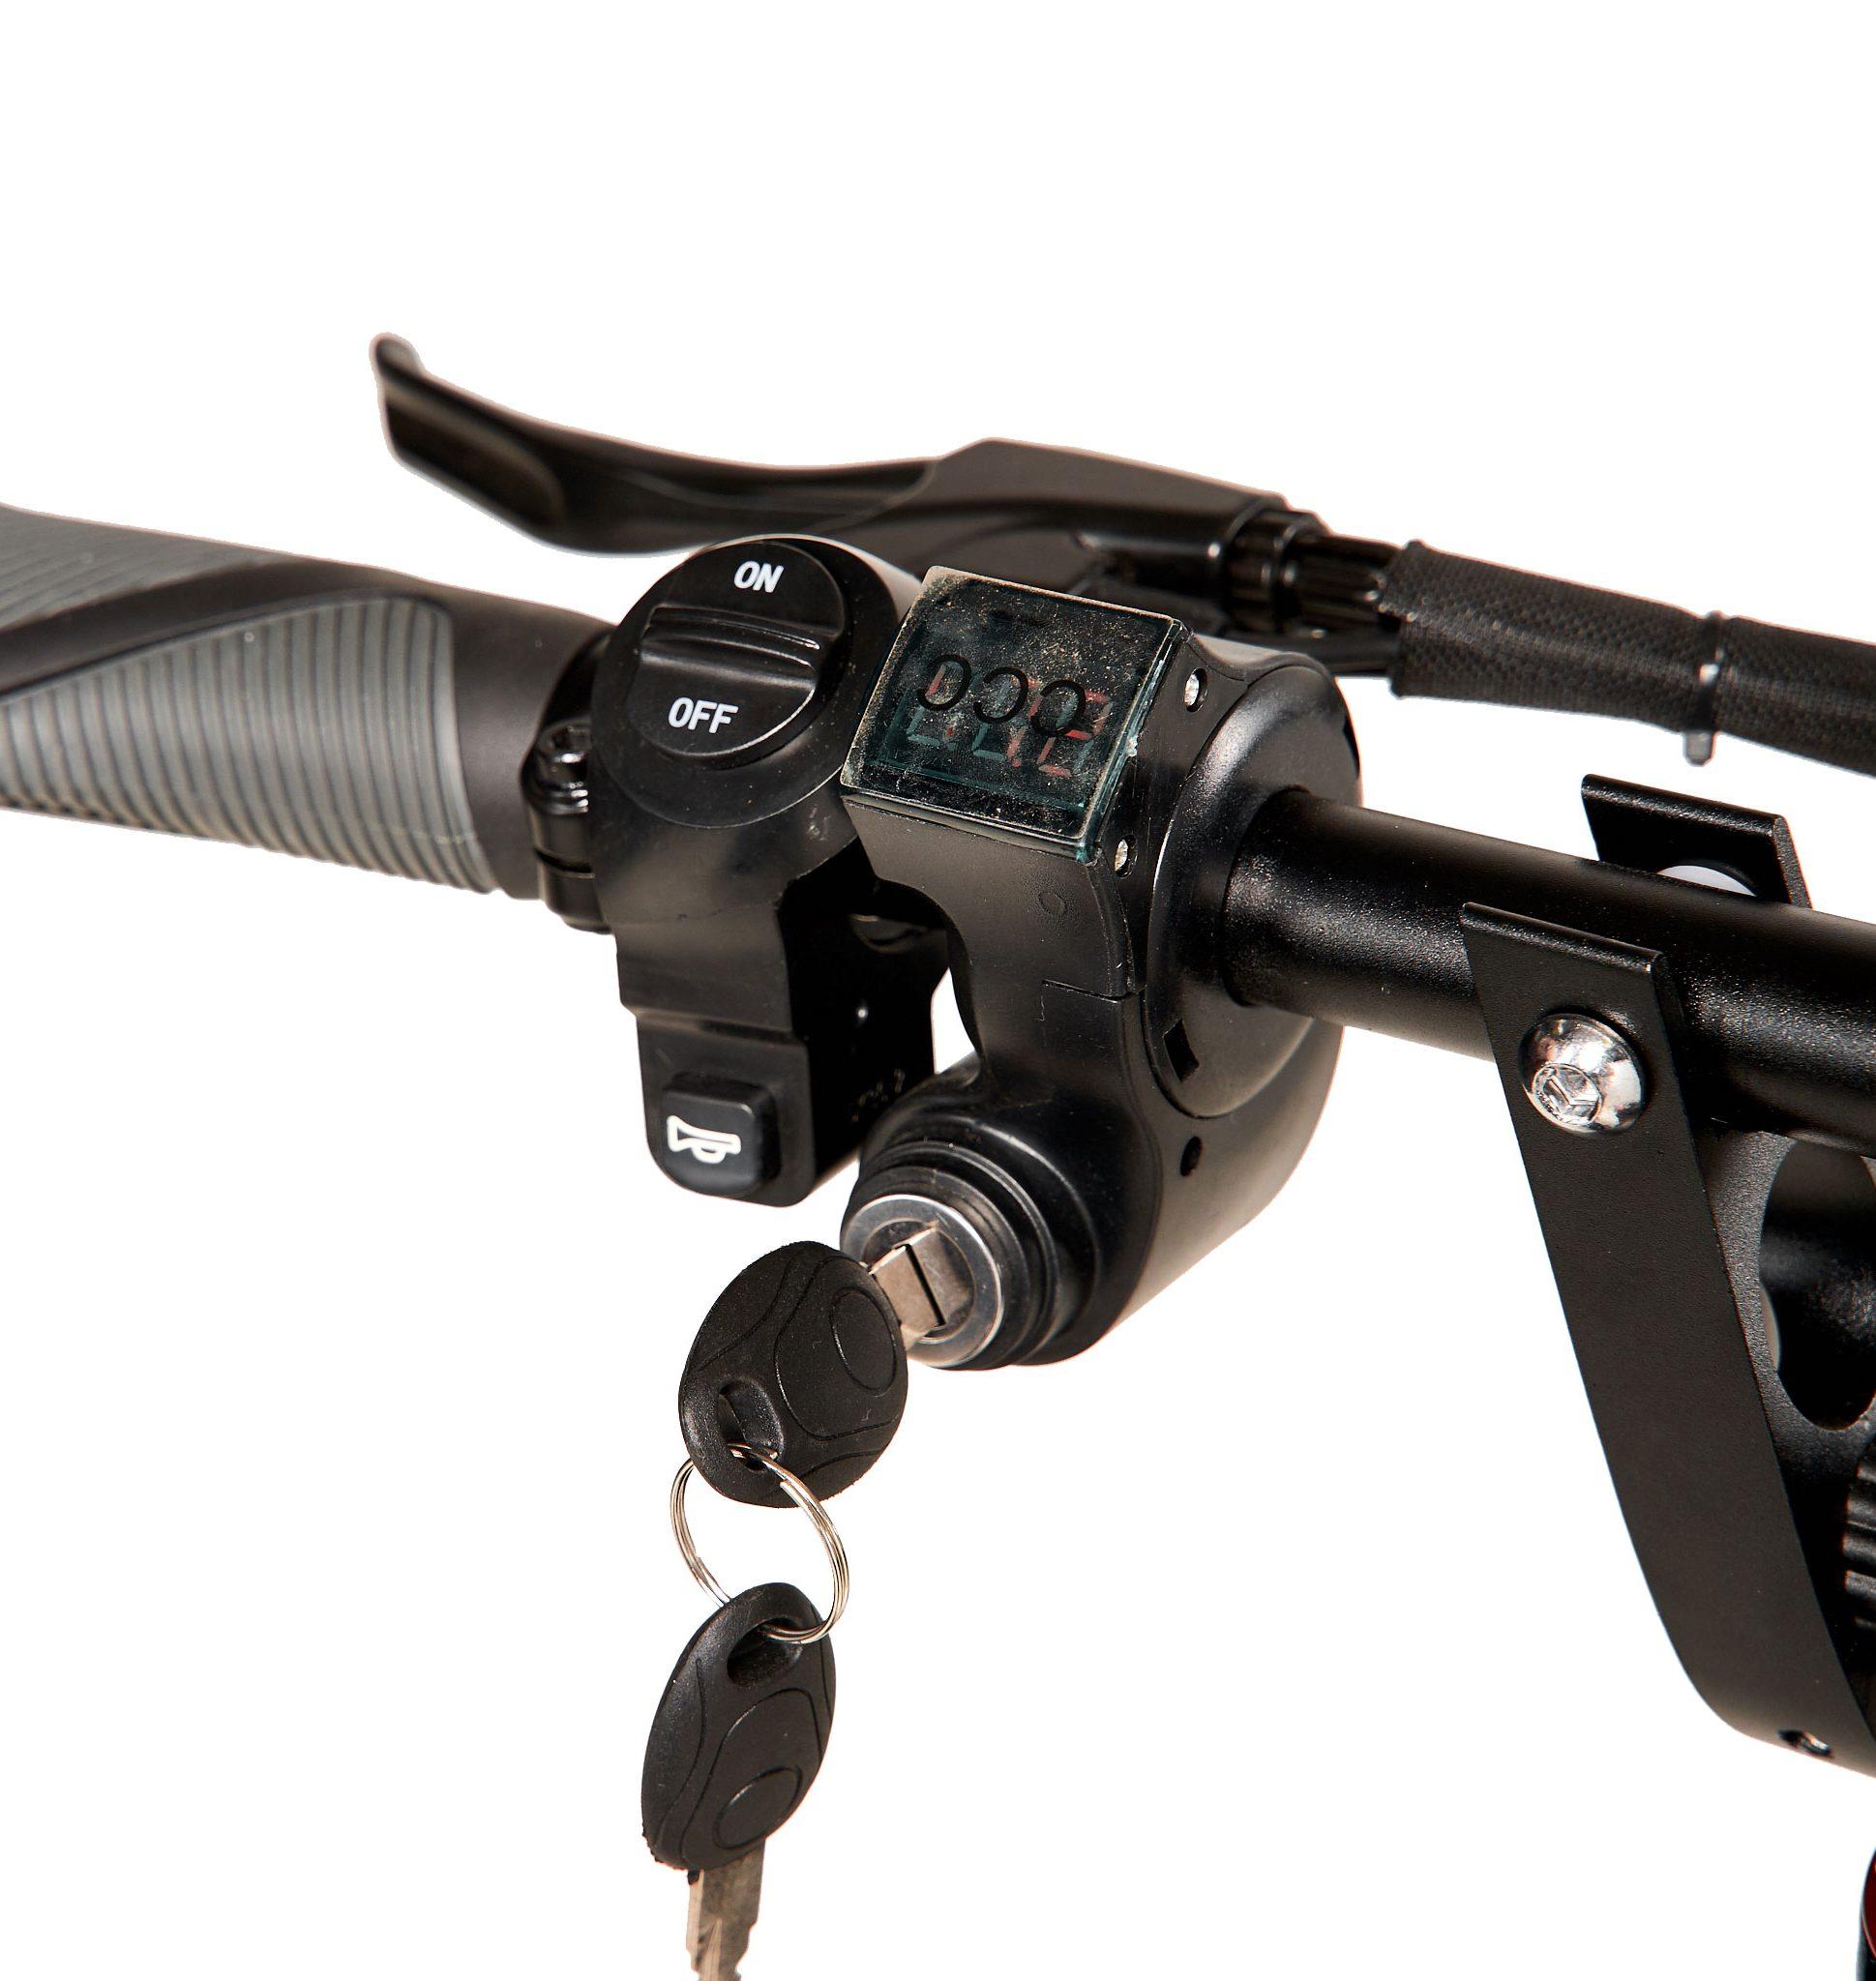 Вольтметр с ключом зажигания для Ultron T103, T10, T11, Т118, Т108, Т128